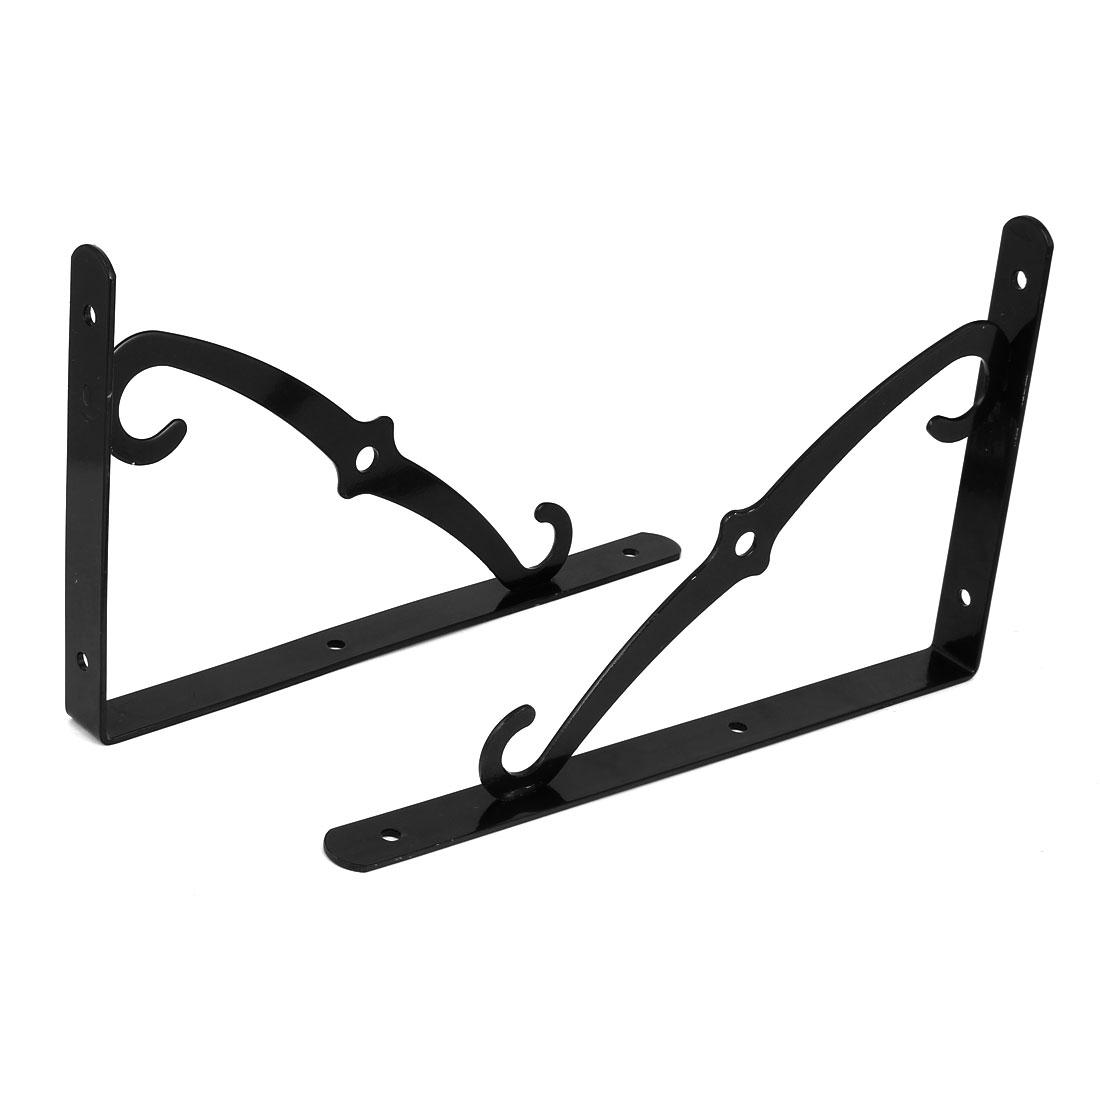 300mm x 193mm 90 degree Wall Mounted Shelf Bracket Brace Support Black 2pcs